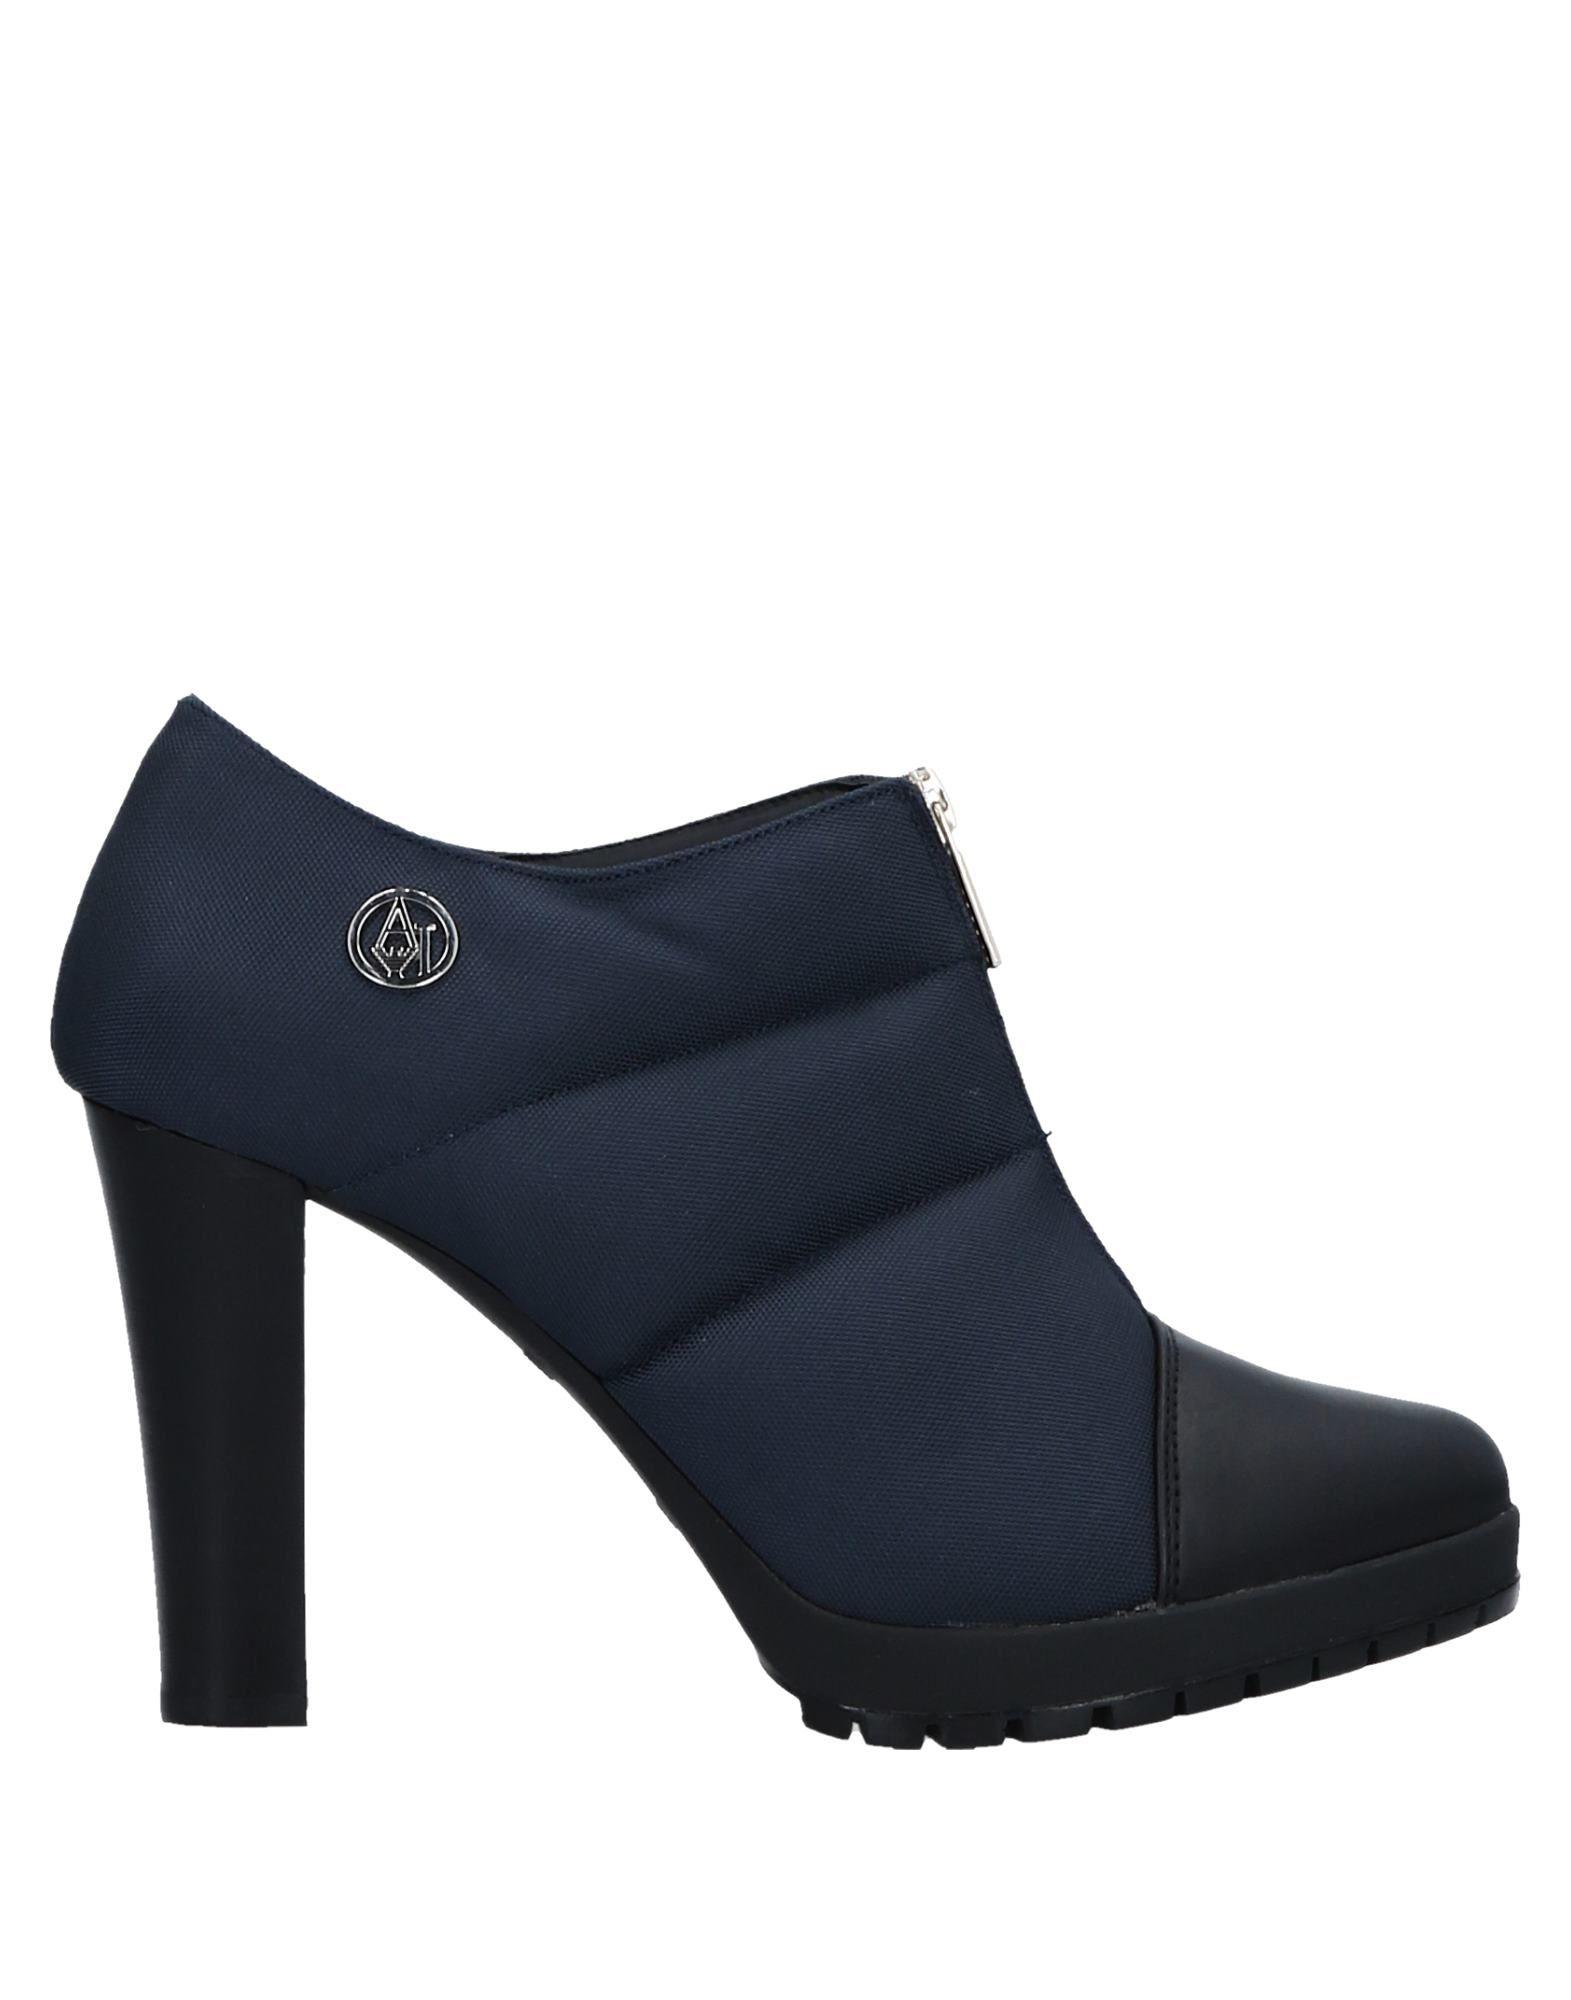 Azul Azul Azul oscuro Botín Armani Jeans Mujer - Botines Armani Jeans eaa4ee